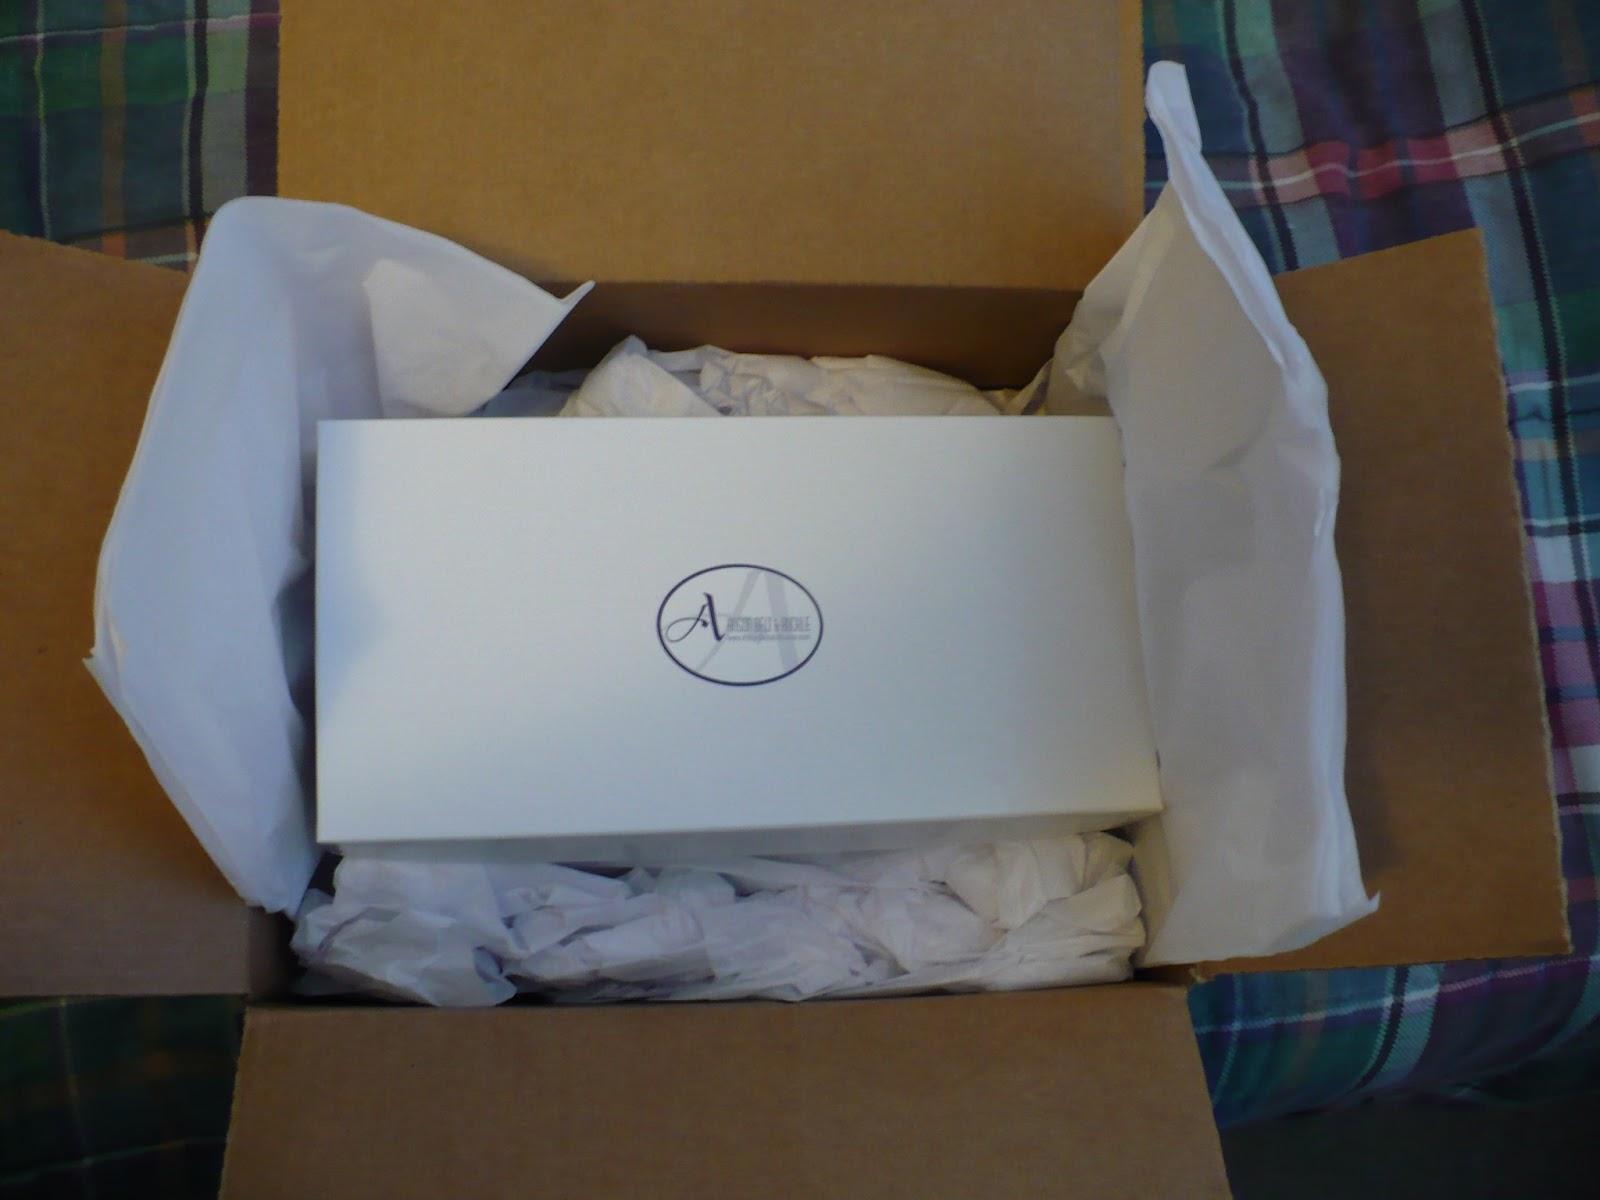 Anson Belt box